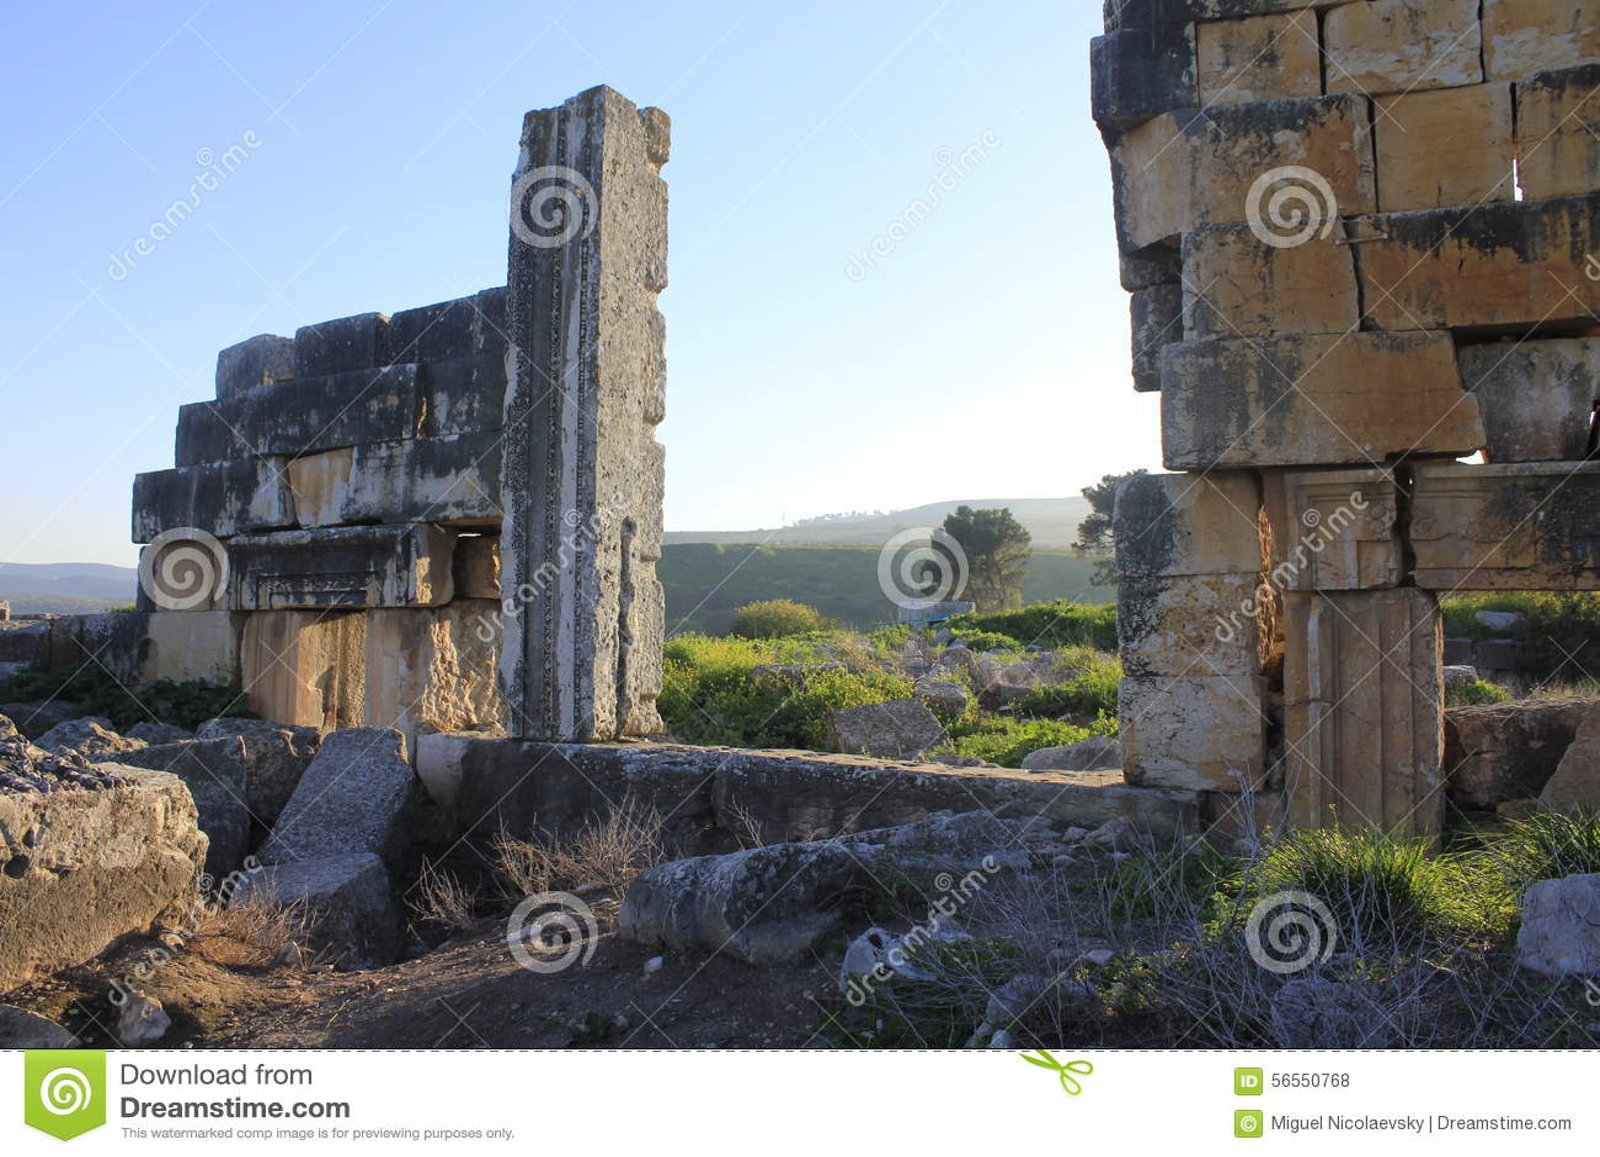 Download Καταστροφές της αρχαίας πόλης βιβλικού Kedesh στο Ισραήλ Στοκ Εικόνες - εικόνα από λίβανος, ancientness: 56550768